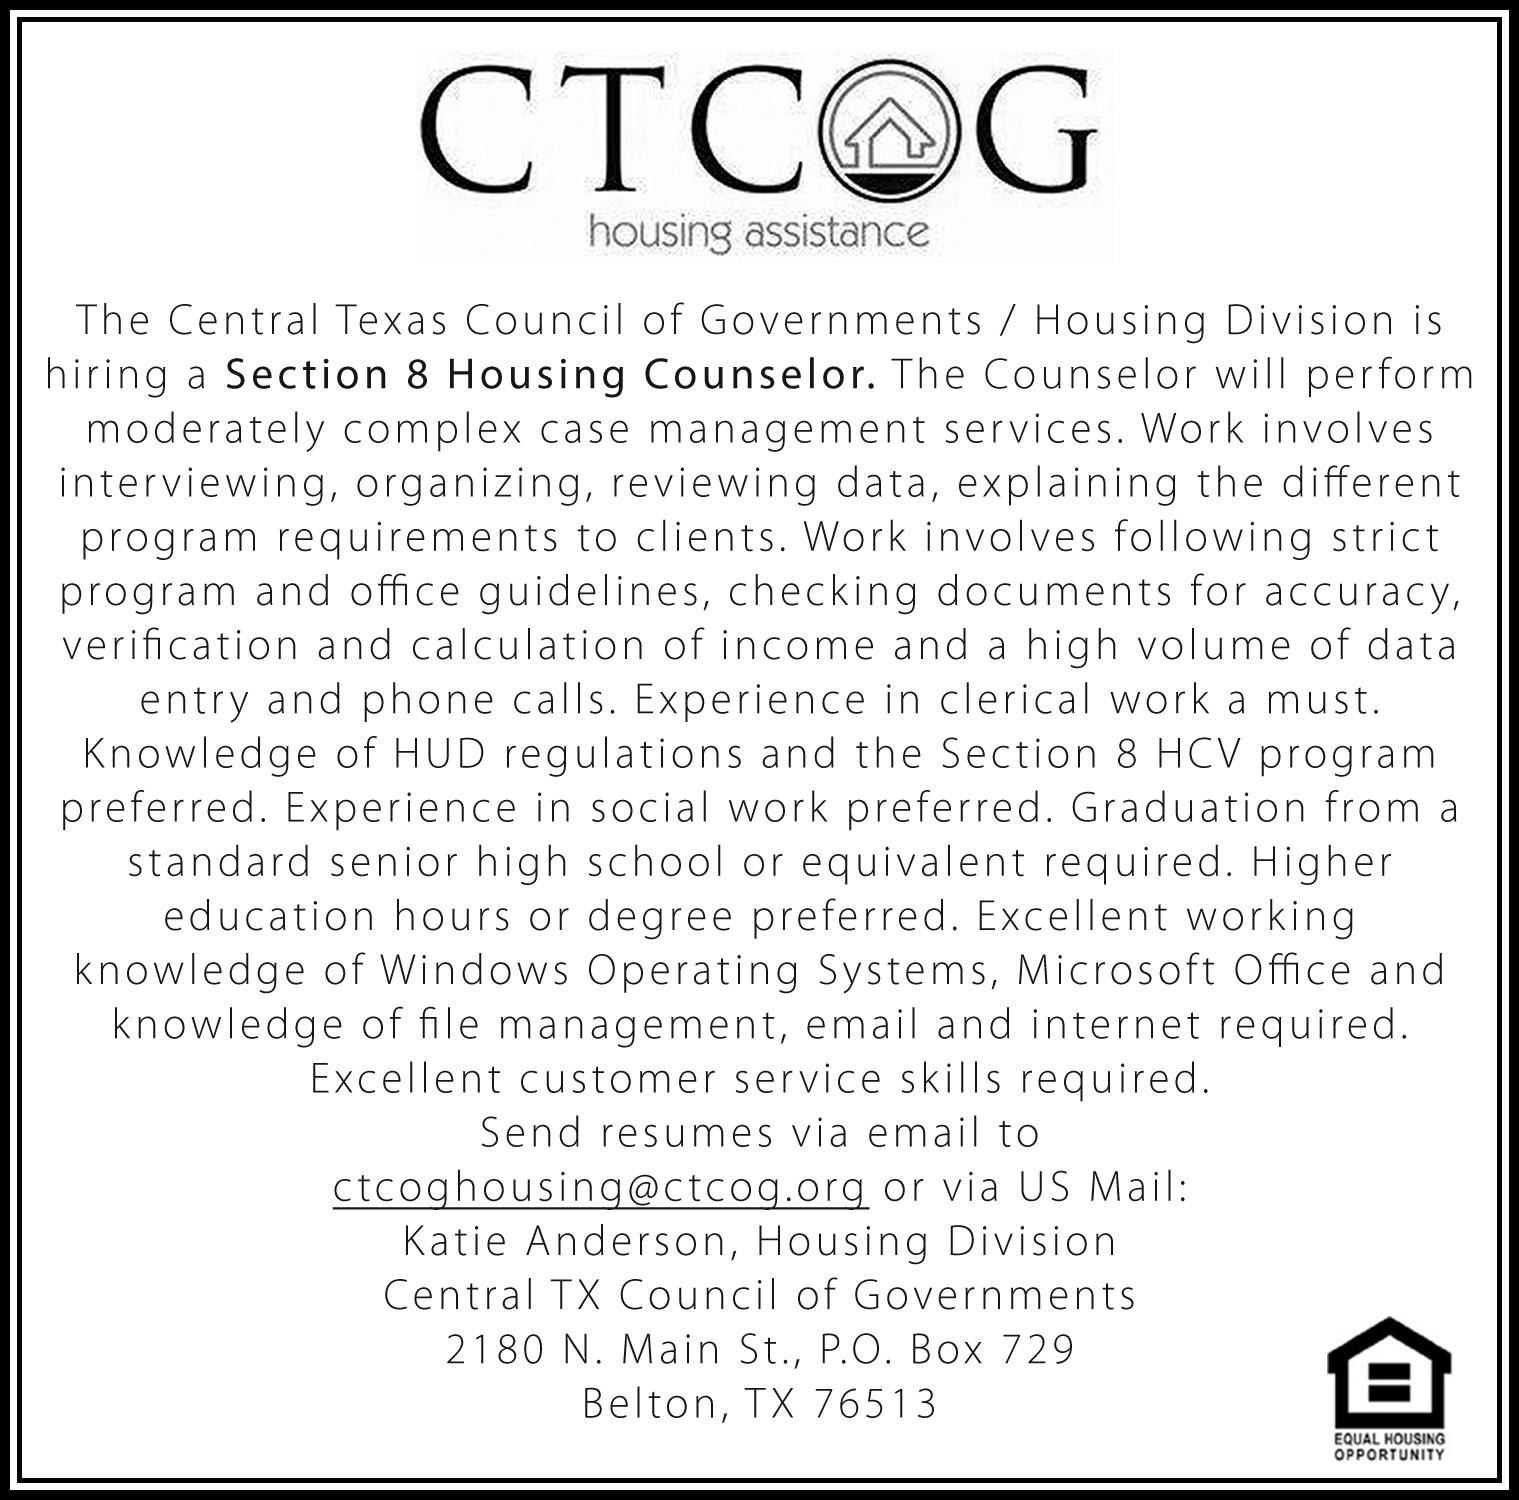 CTCOG/Housing